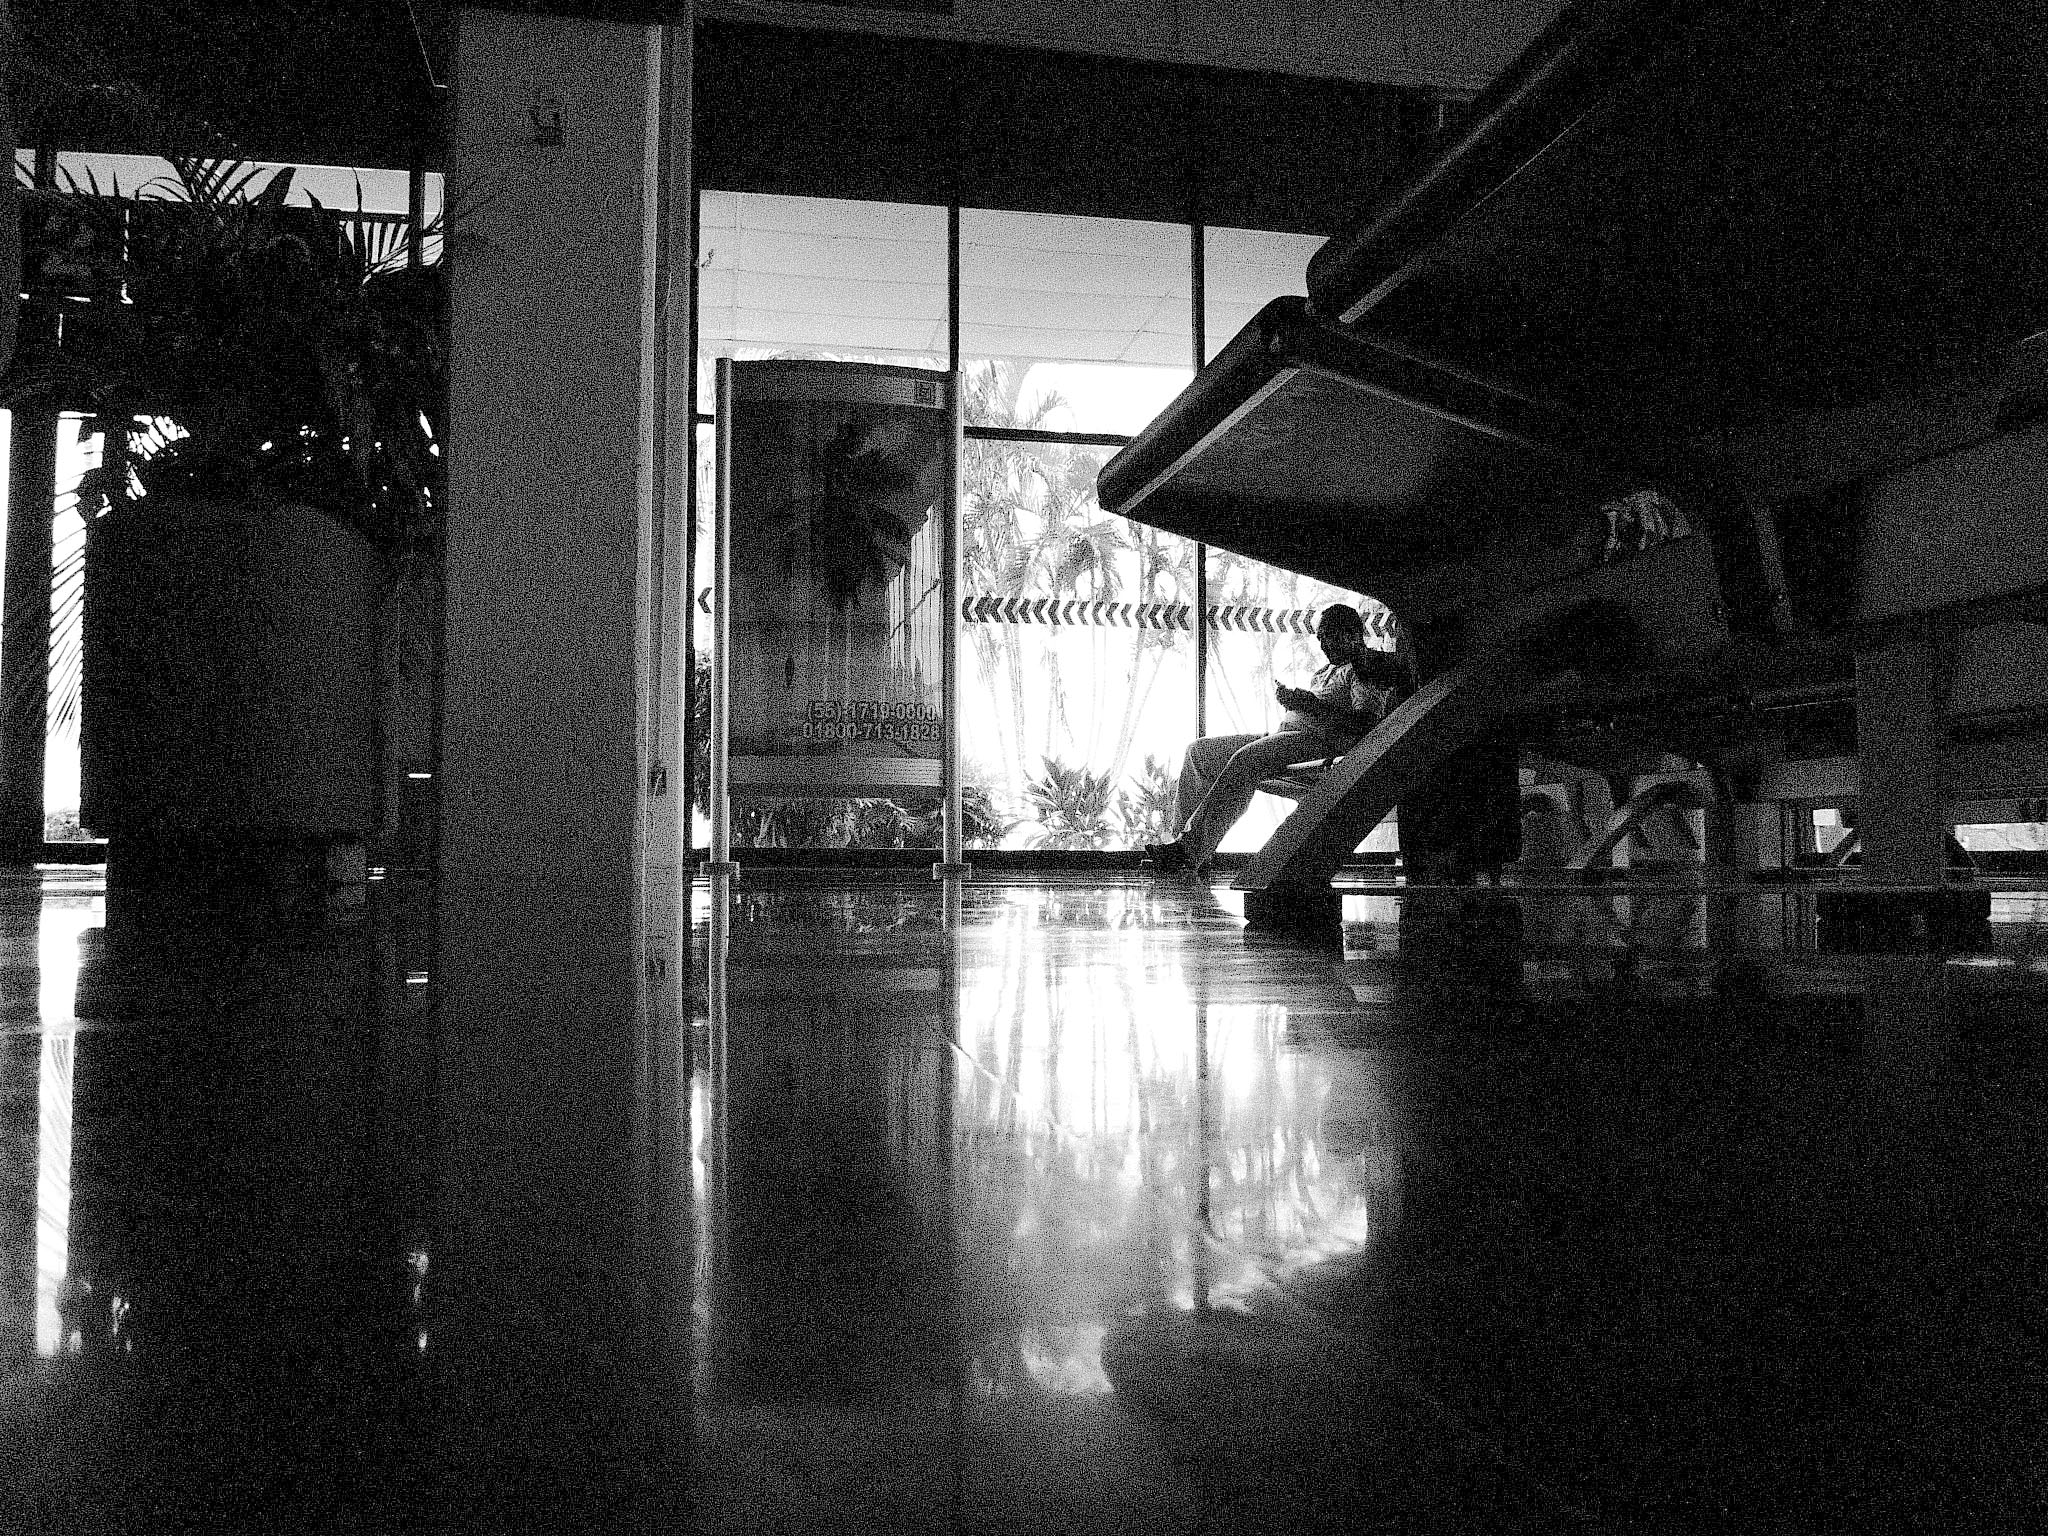 Aeropuerto PE 2